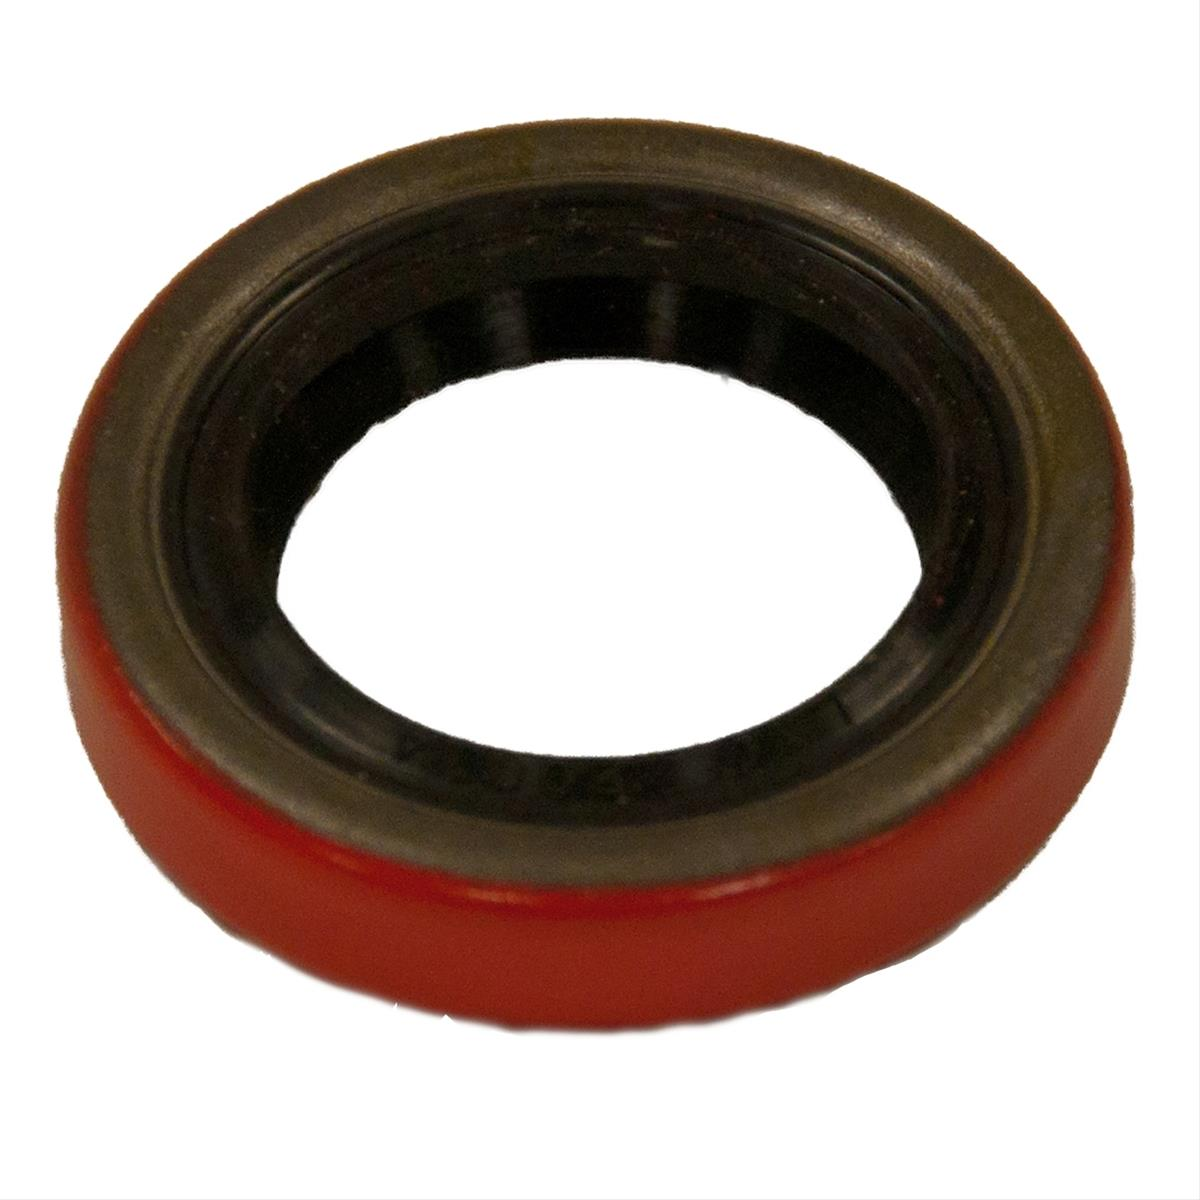 ATP Automotive JO-19 Automatic Transmission Seal Drive Axle